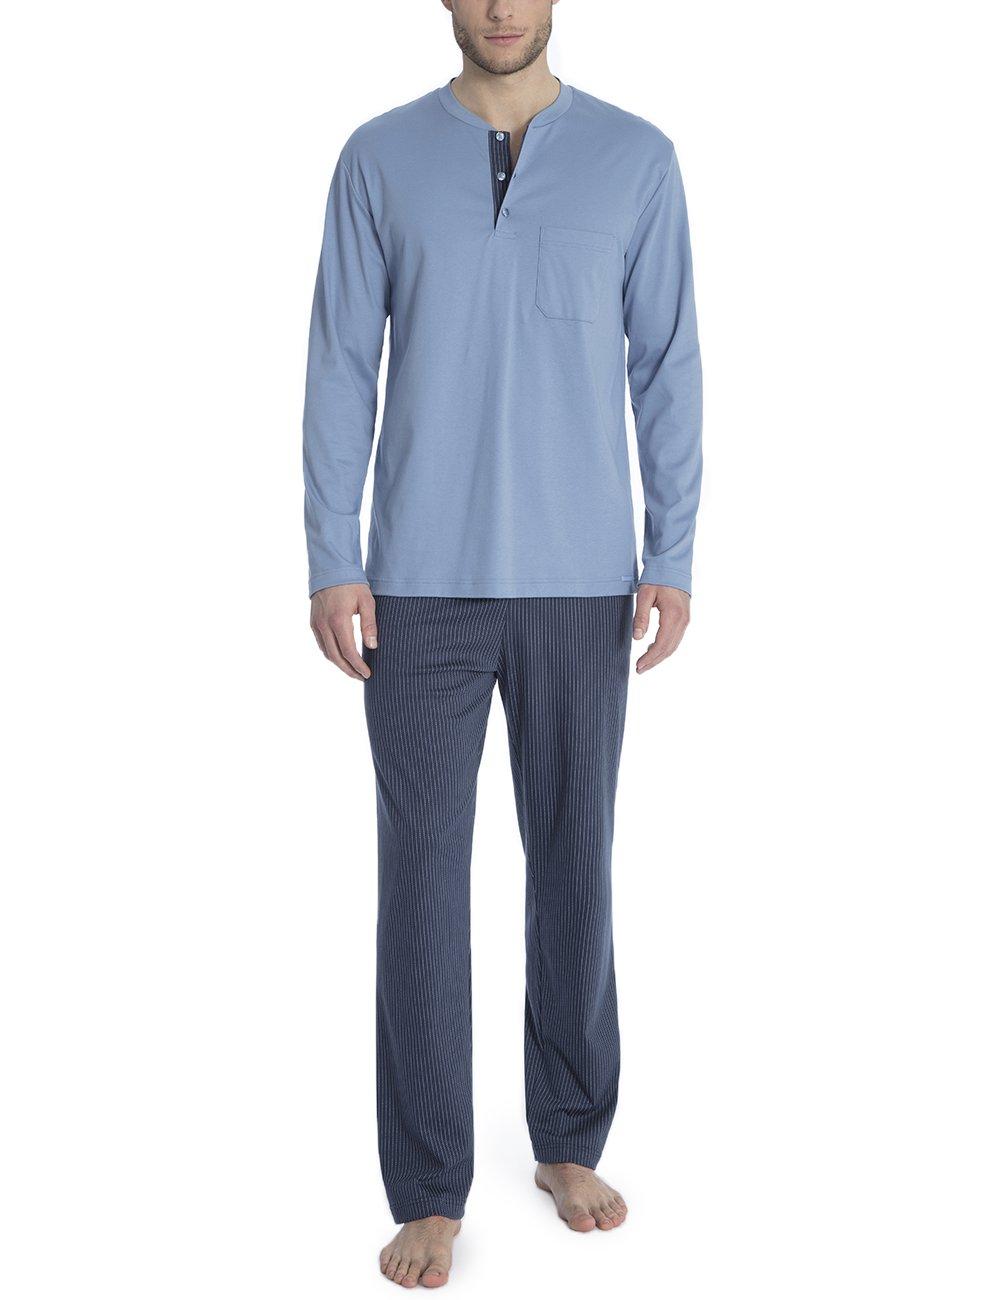 Calida Ensemble Garry PyjamaBleuinfinity Homme De Blue 453Xl hxQBsCtrdo